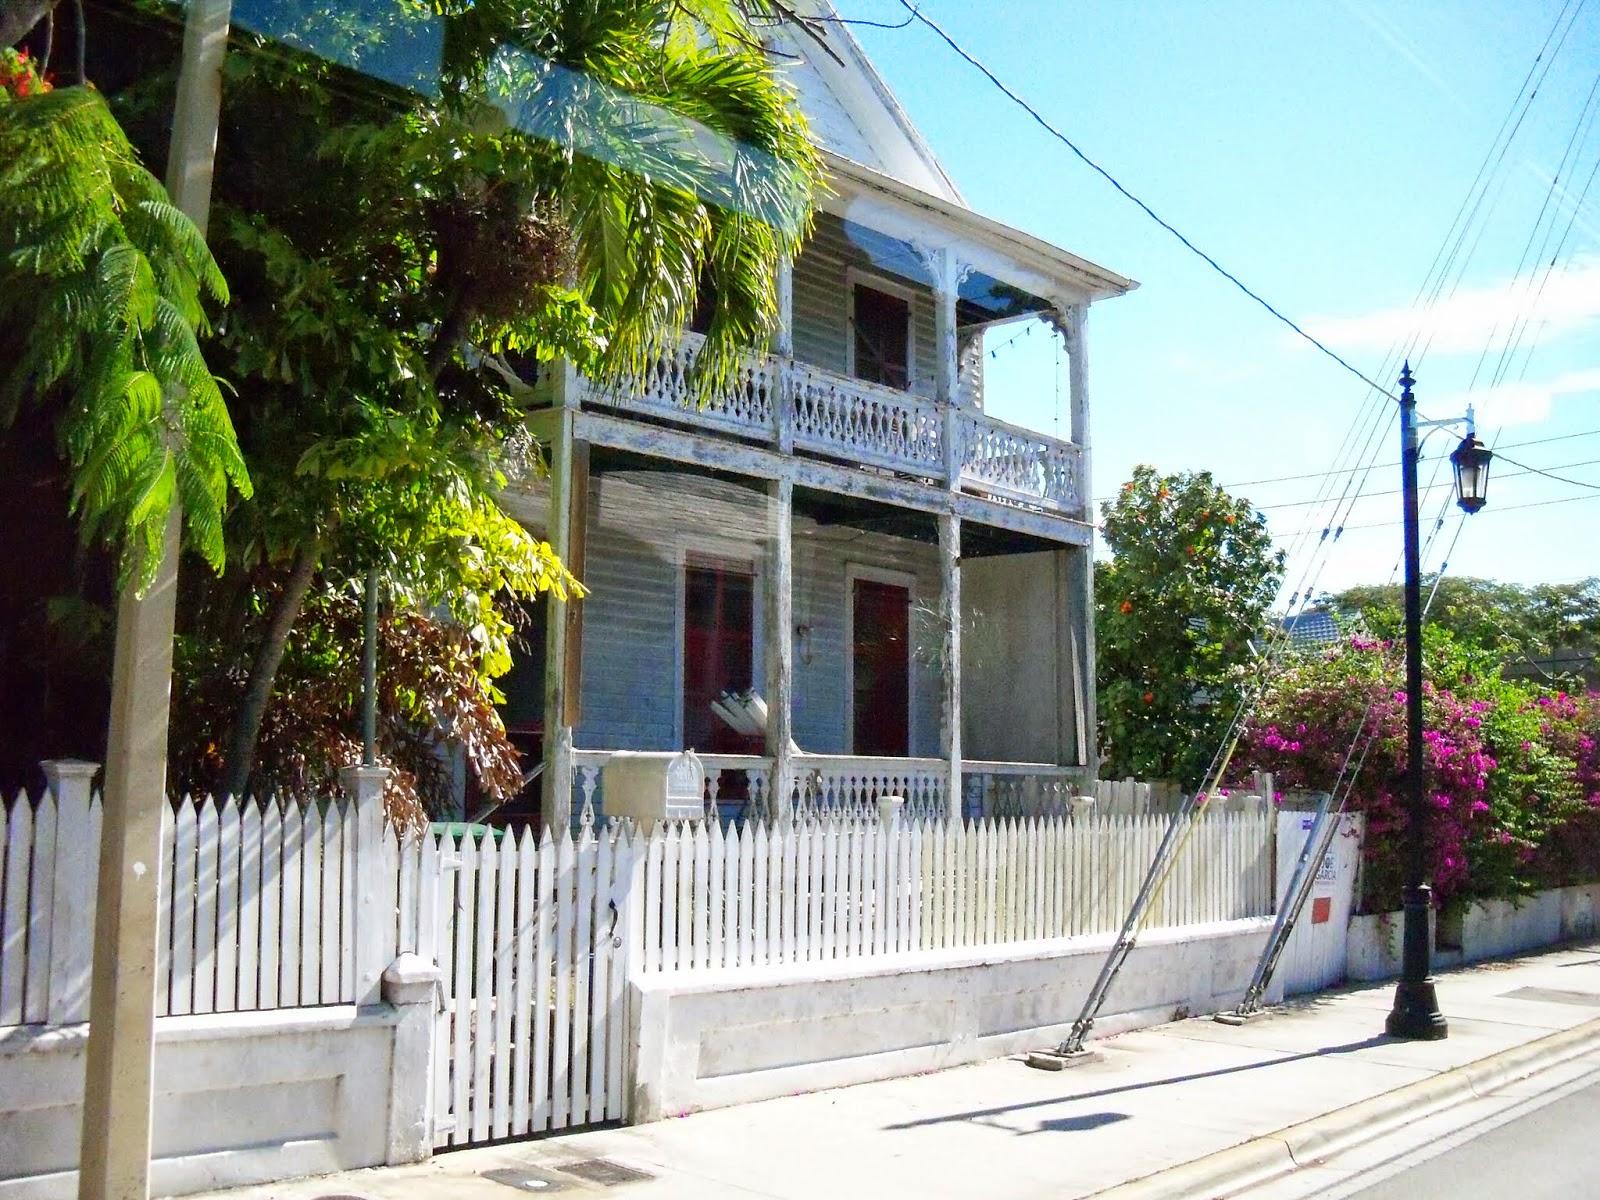 Key West Vacation - 116_5747.JPG